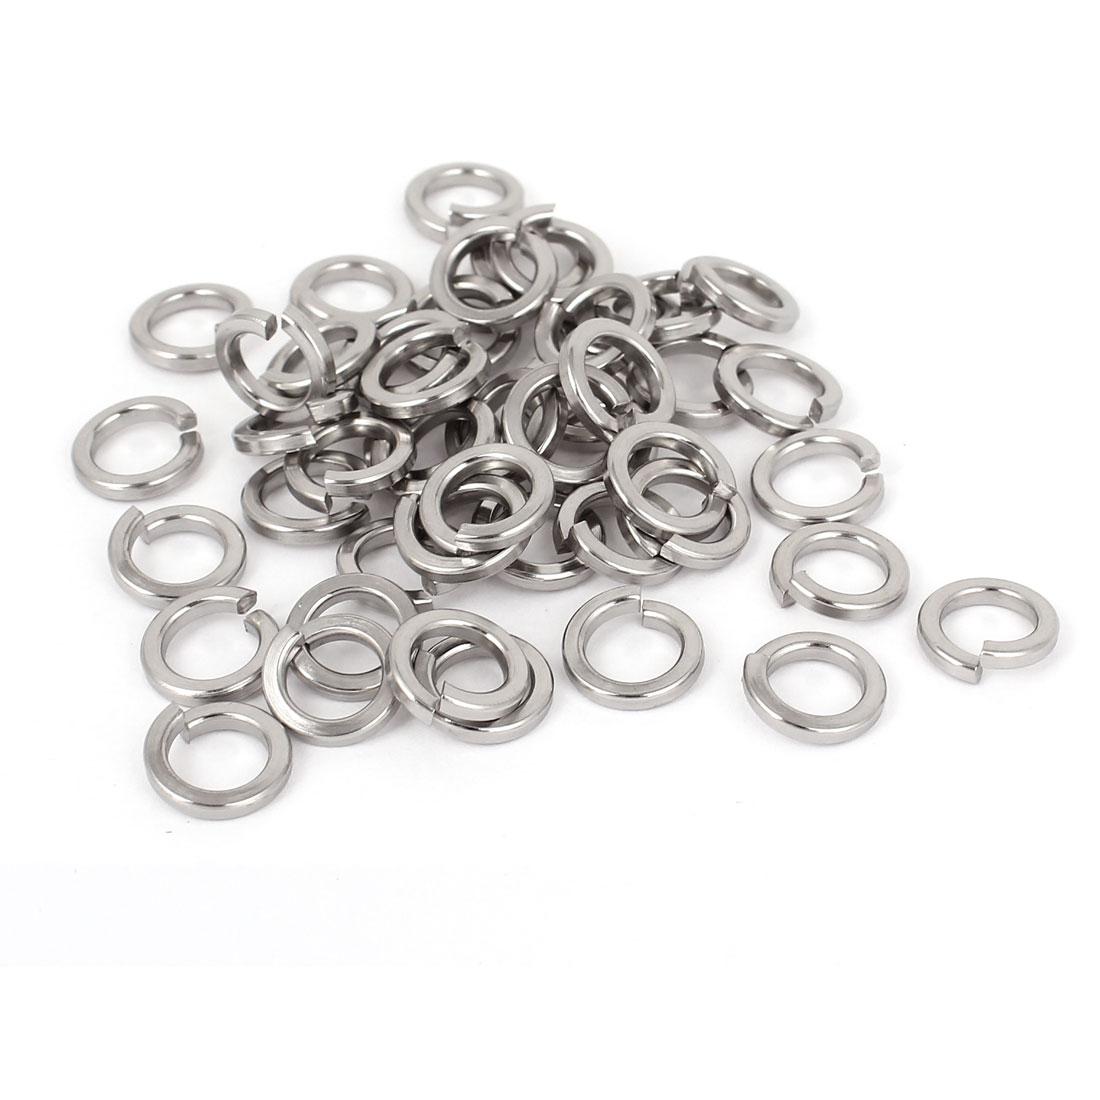 "50pcs 316 Stainless Steel Split Lock Spring Washers 5/16"" Screw Spacer Pad"